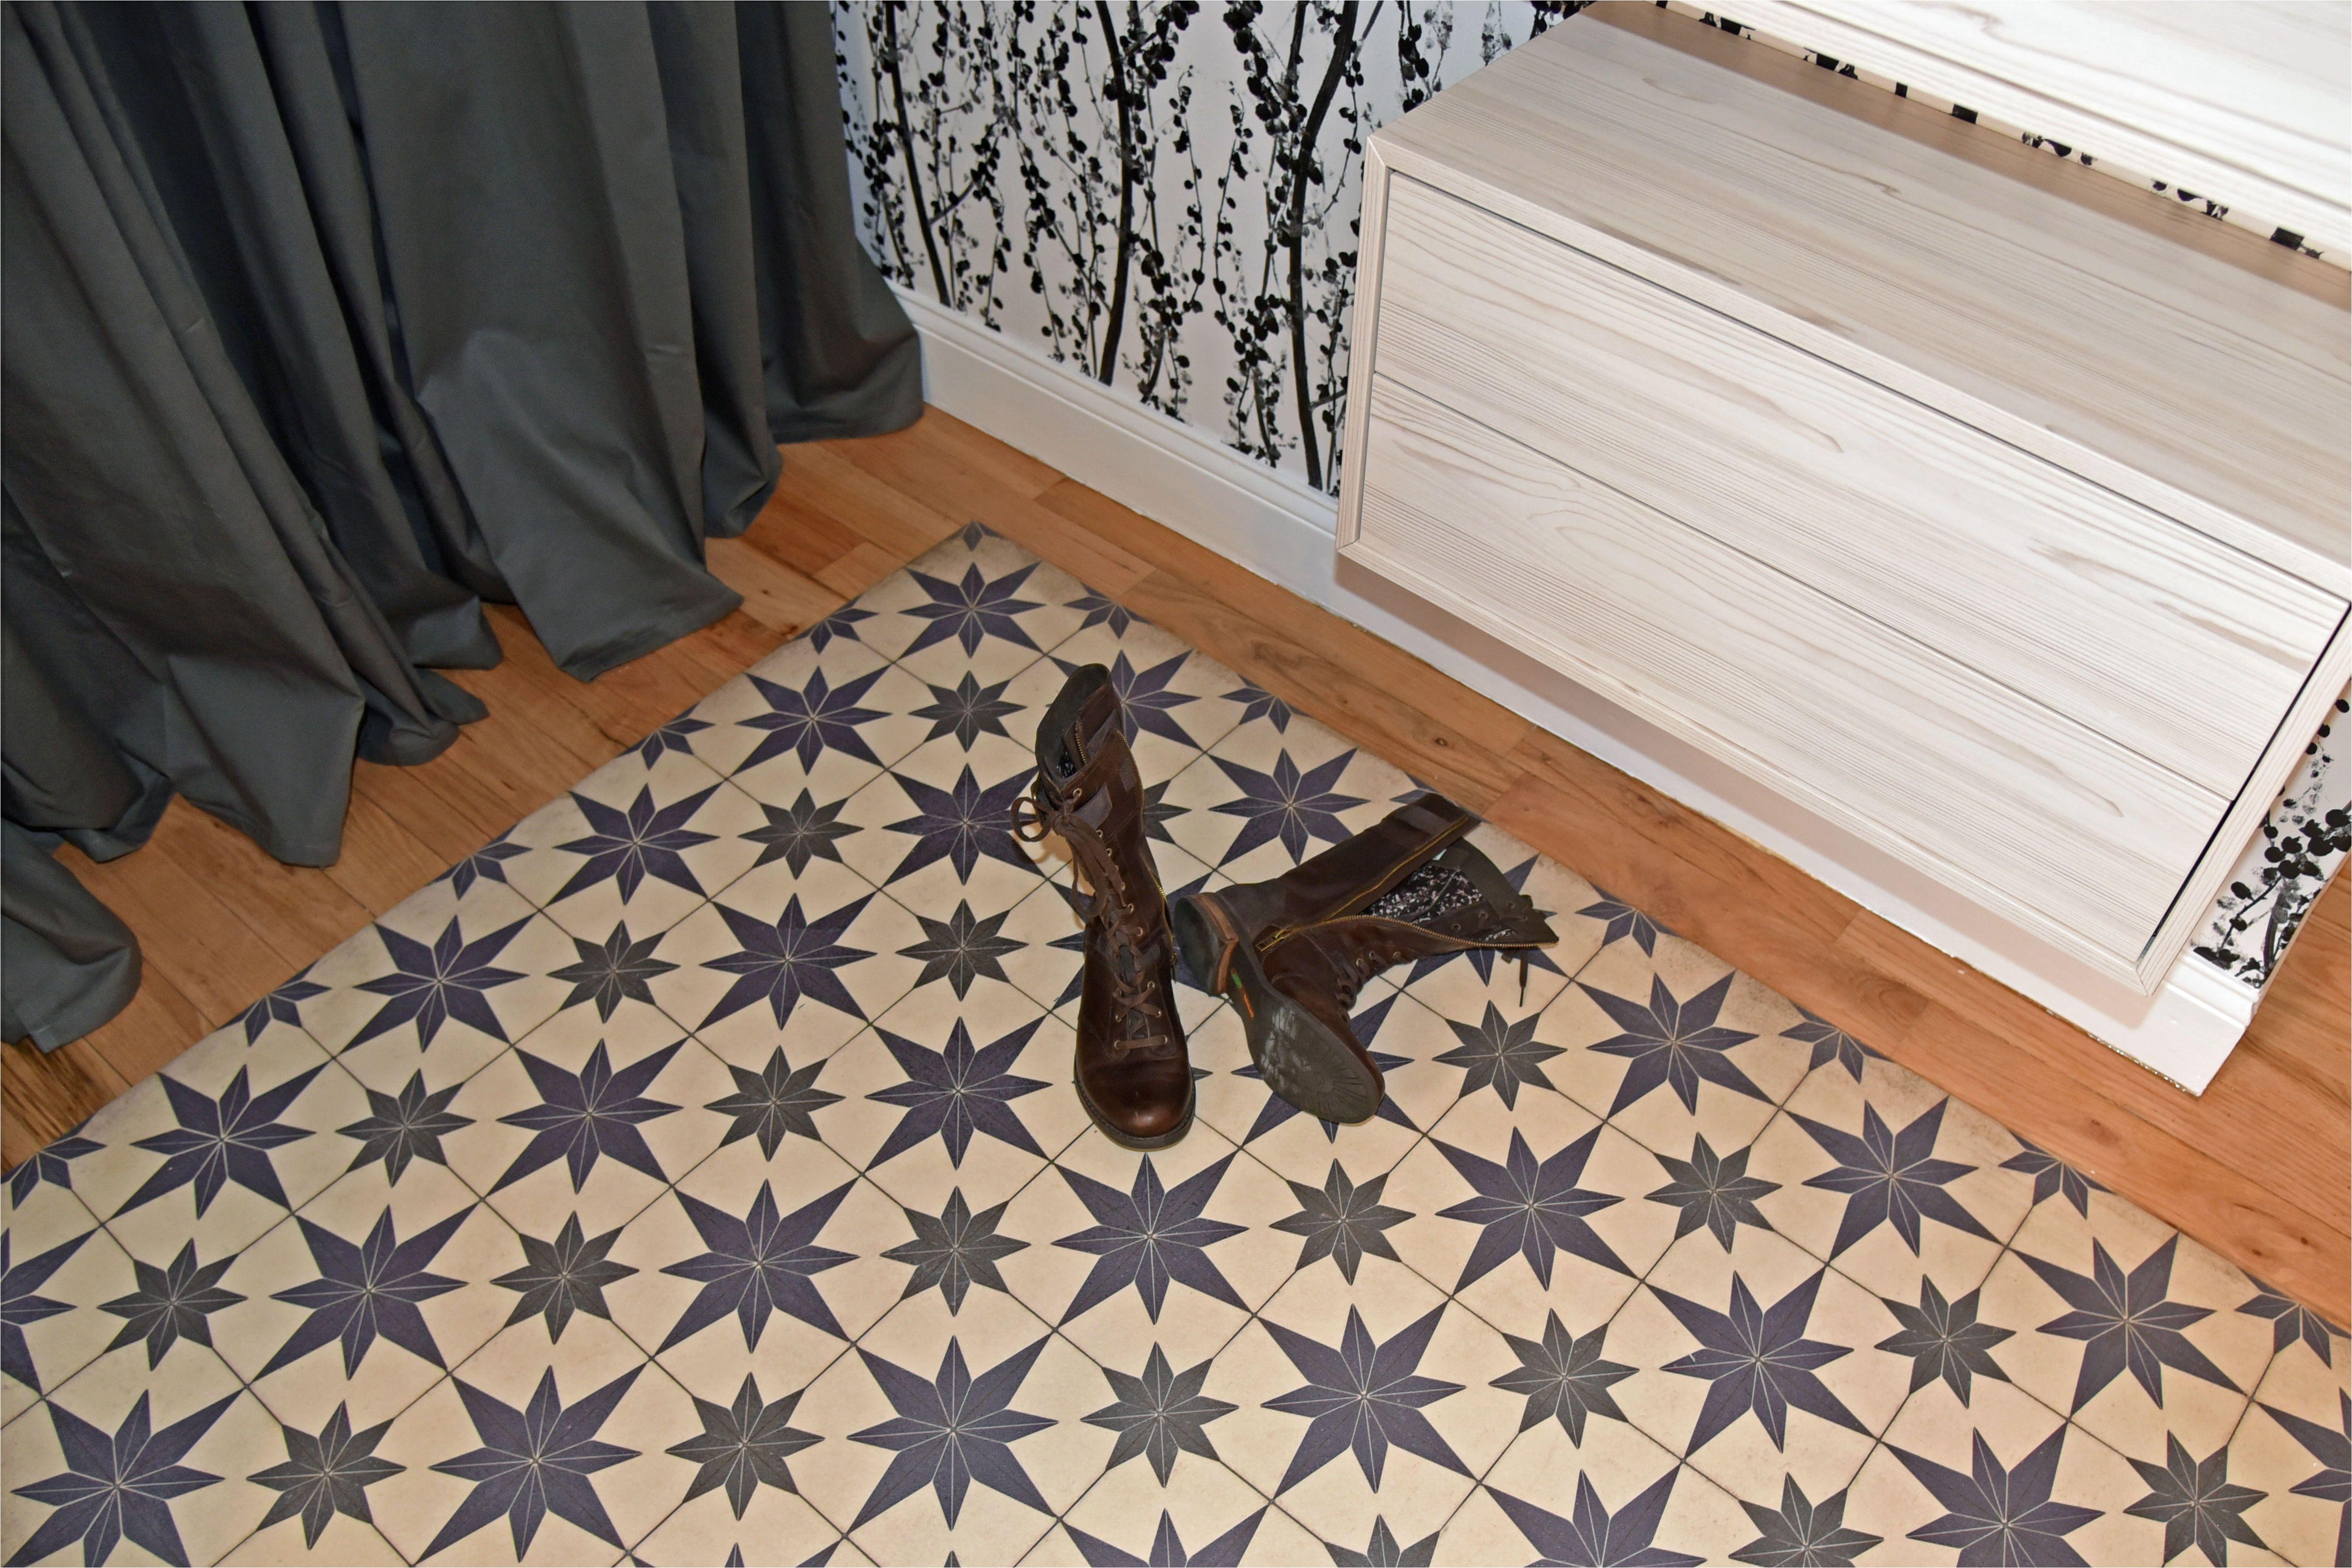 tiny entryway makeover vinyl floor cloth 58ab62a35f9b58a3c9f0ad18